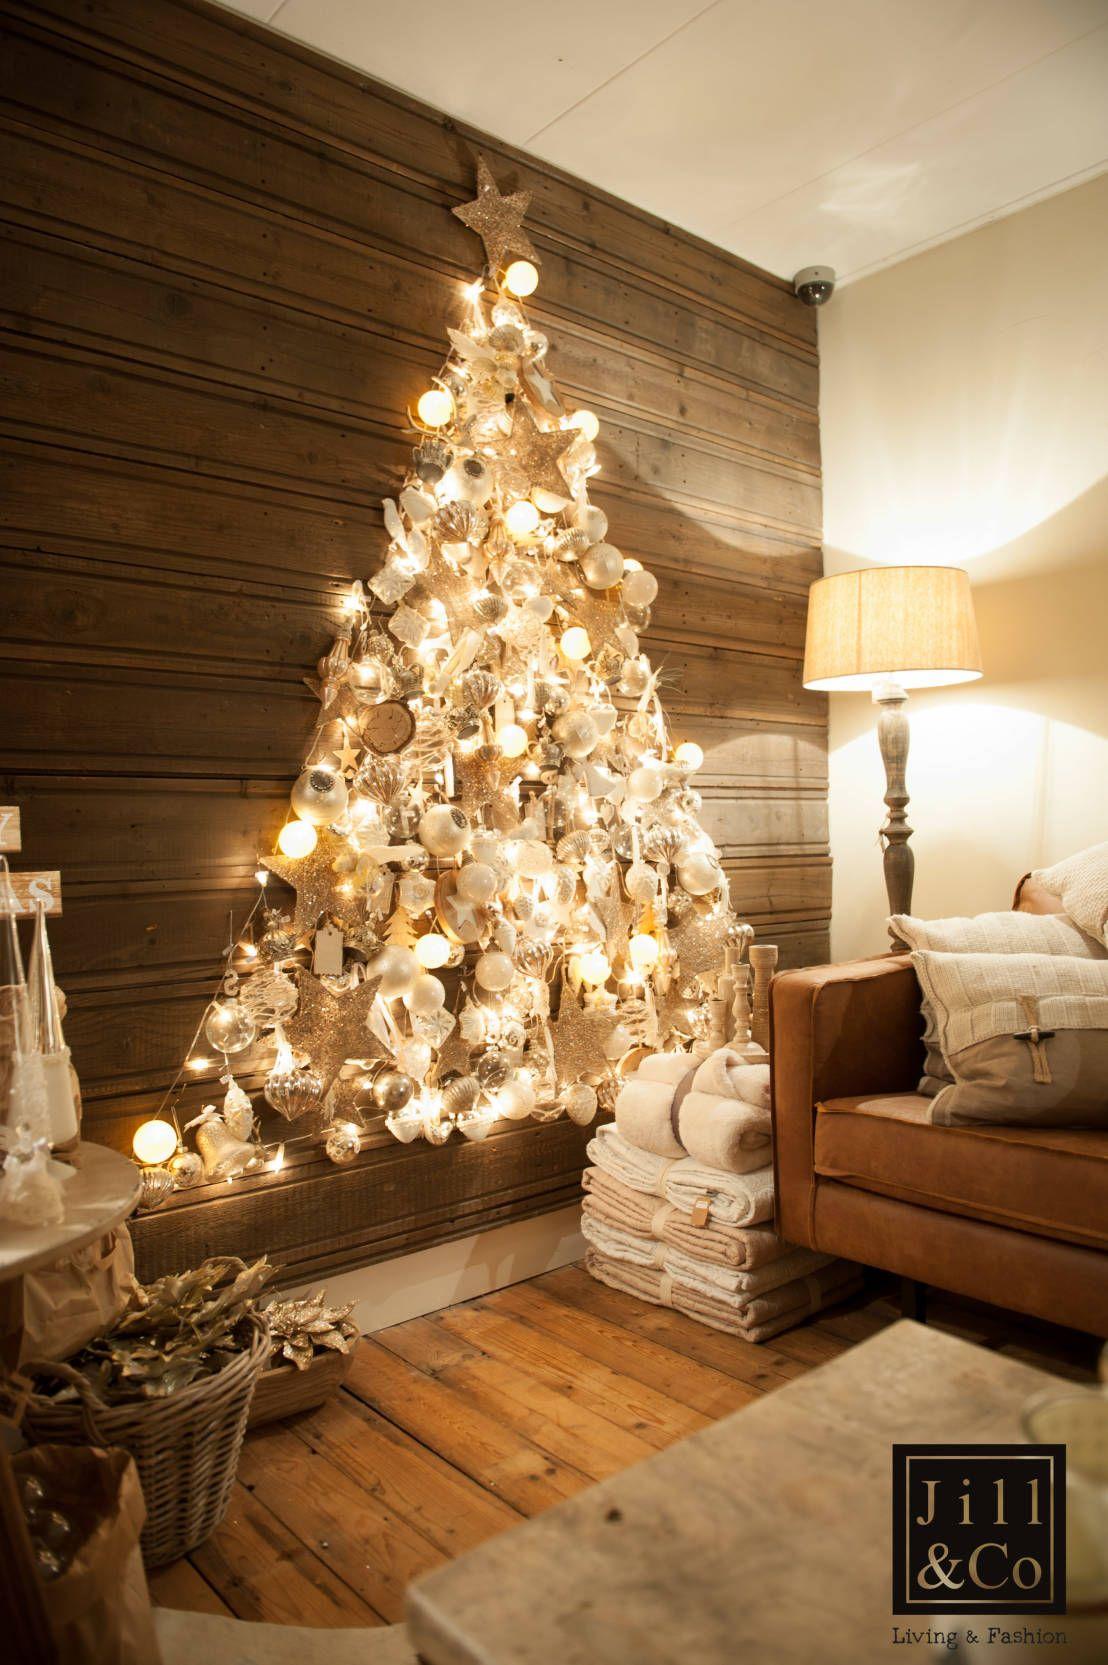 Inspiratie Maak Je Huis Klaar Voor De Kerst Ideas Para Arboles De Navidad Arbol De Navidad Pared Cestas De Navidad